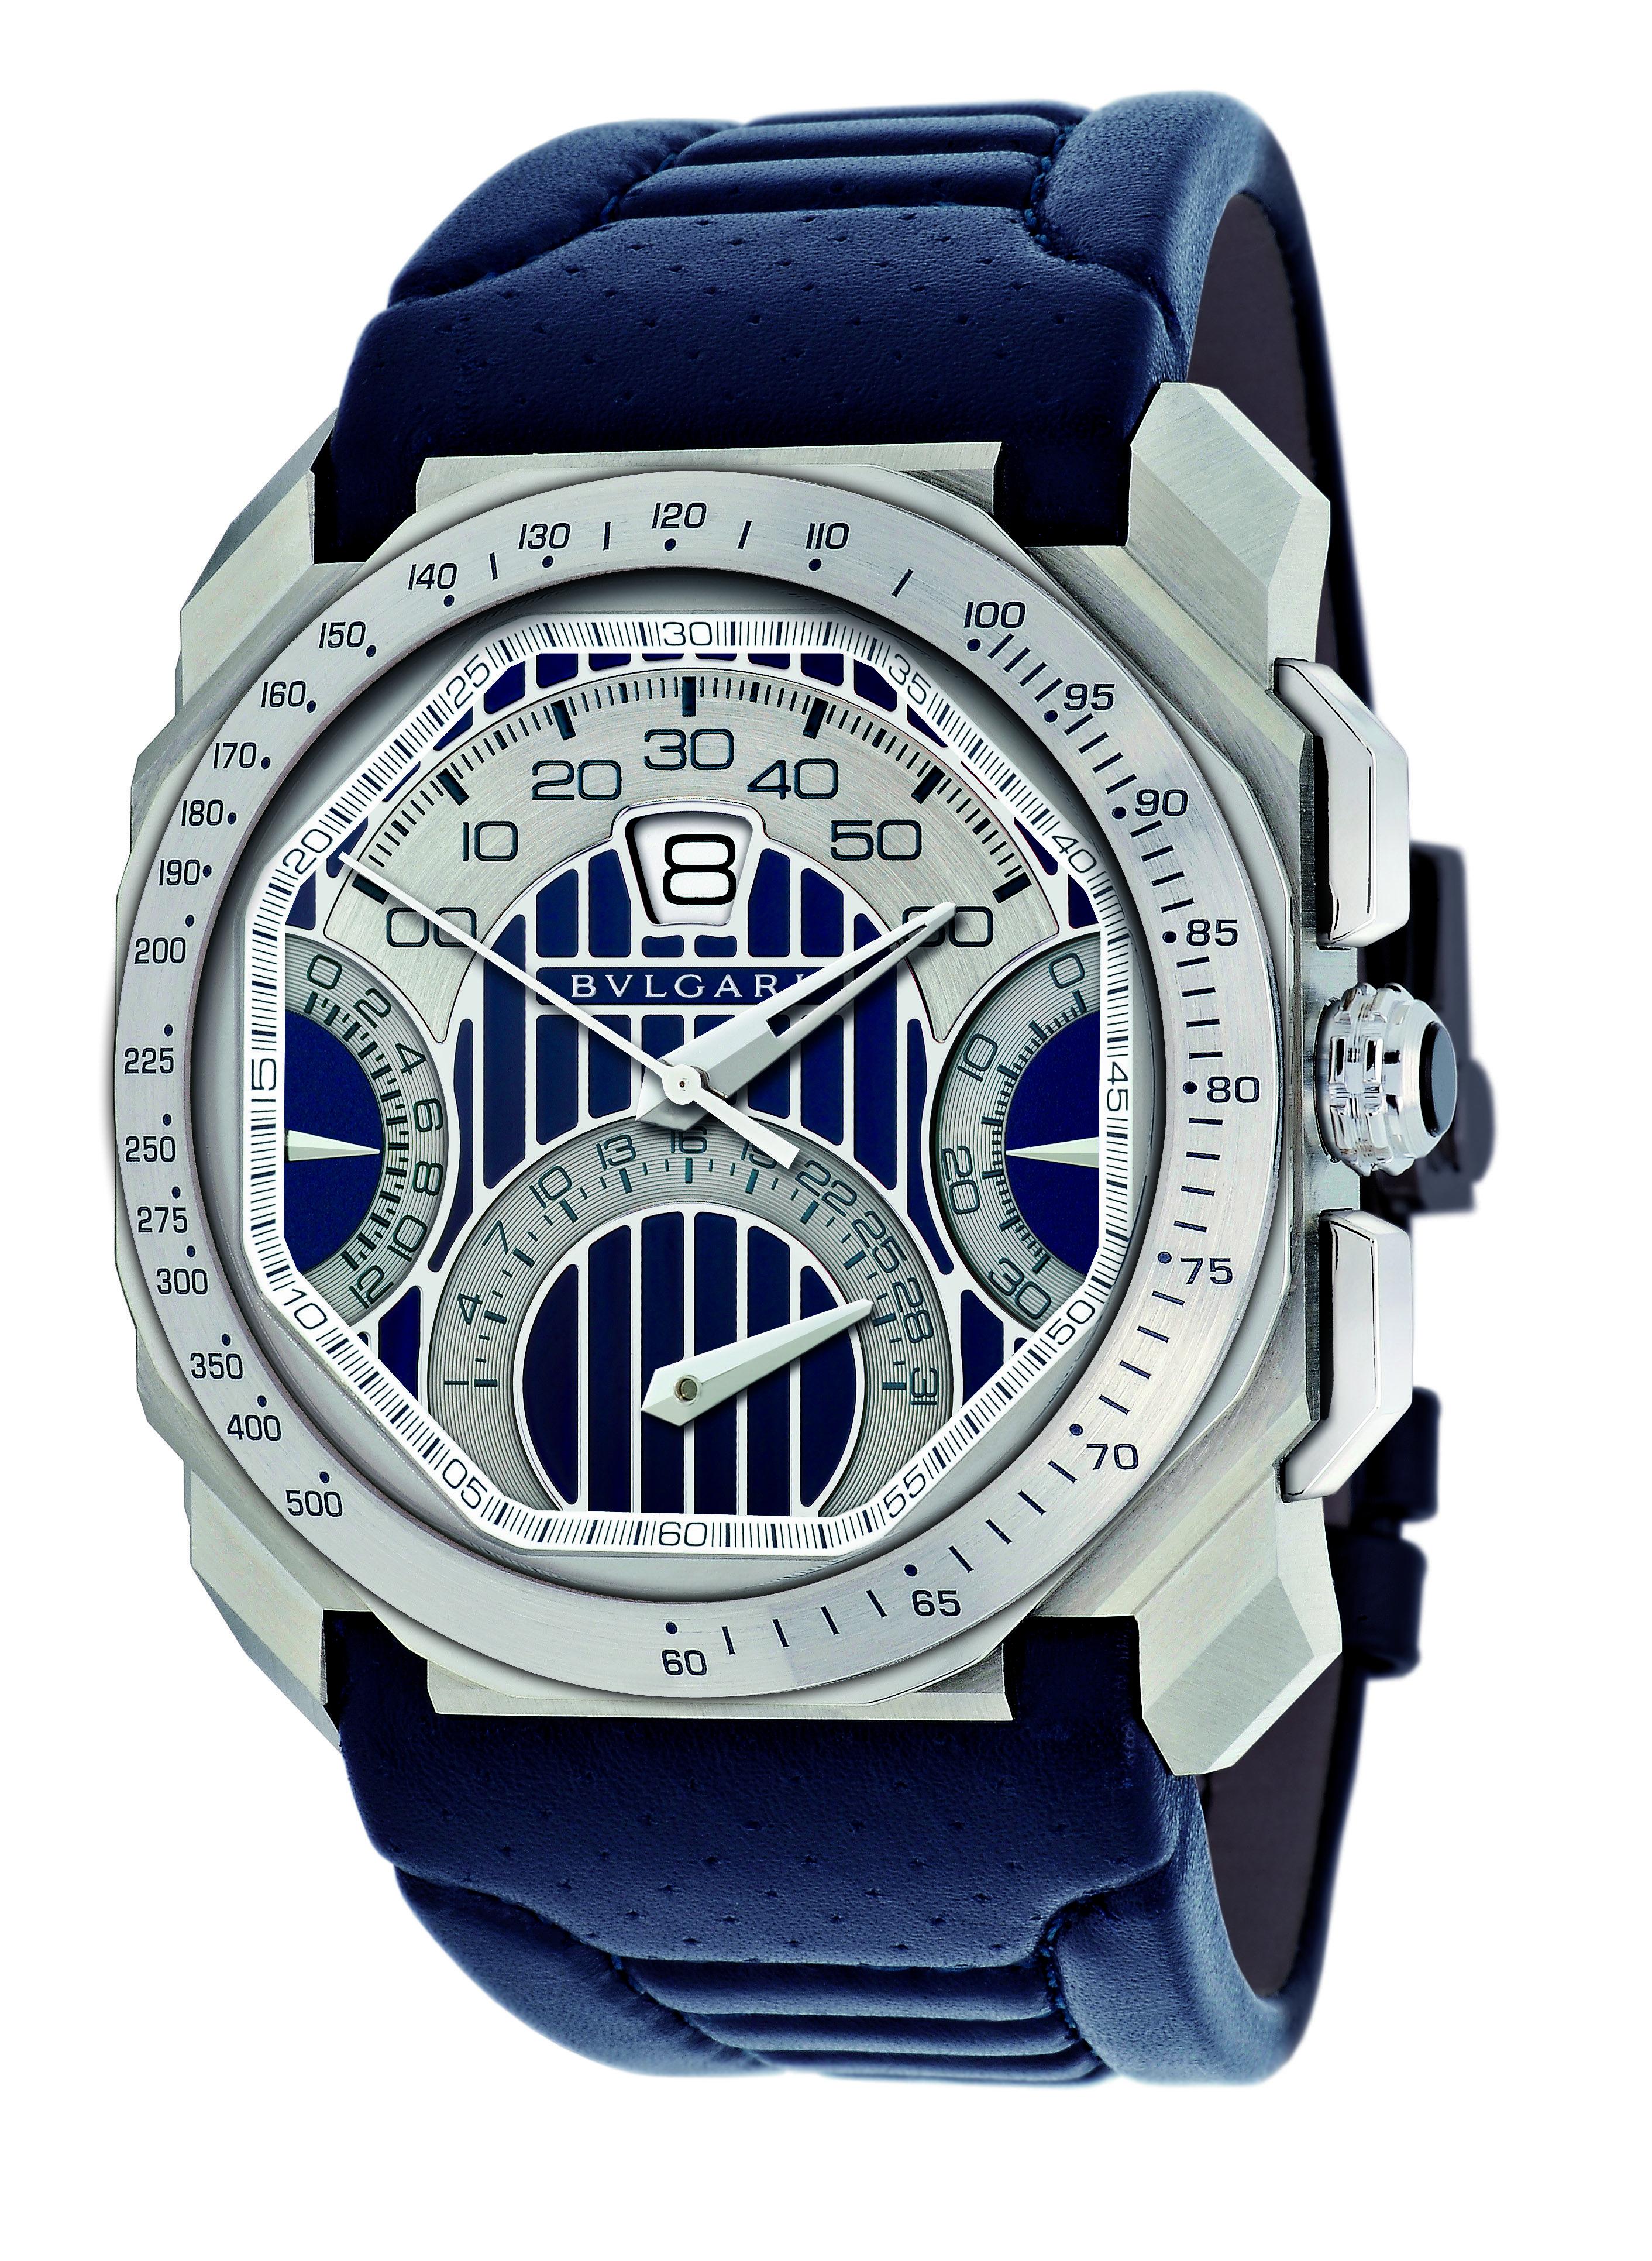 Bulgari Octo Maserati Special Edition | Watches | Pinterest ...